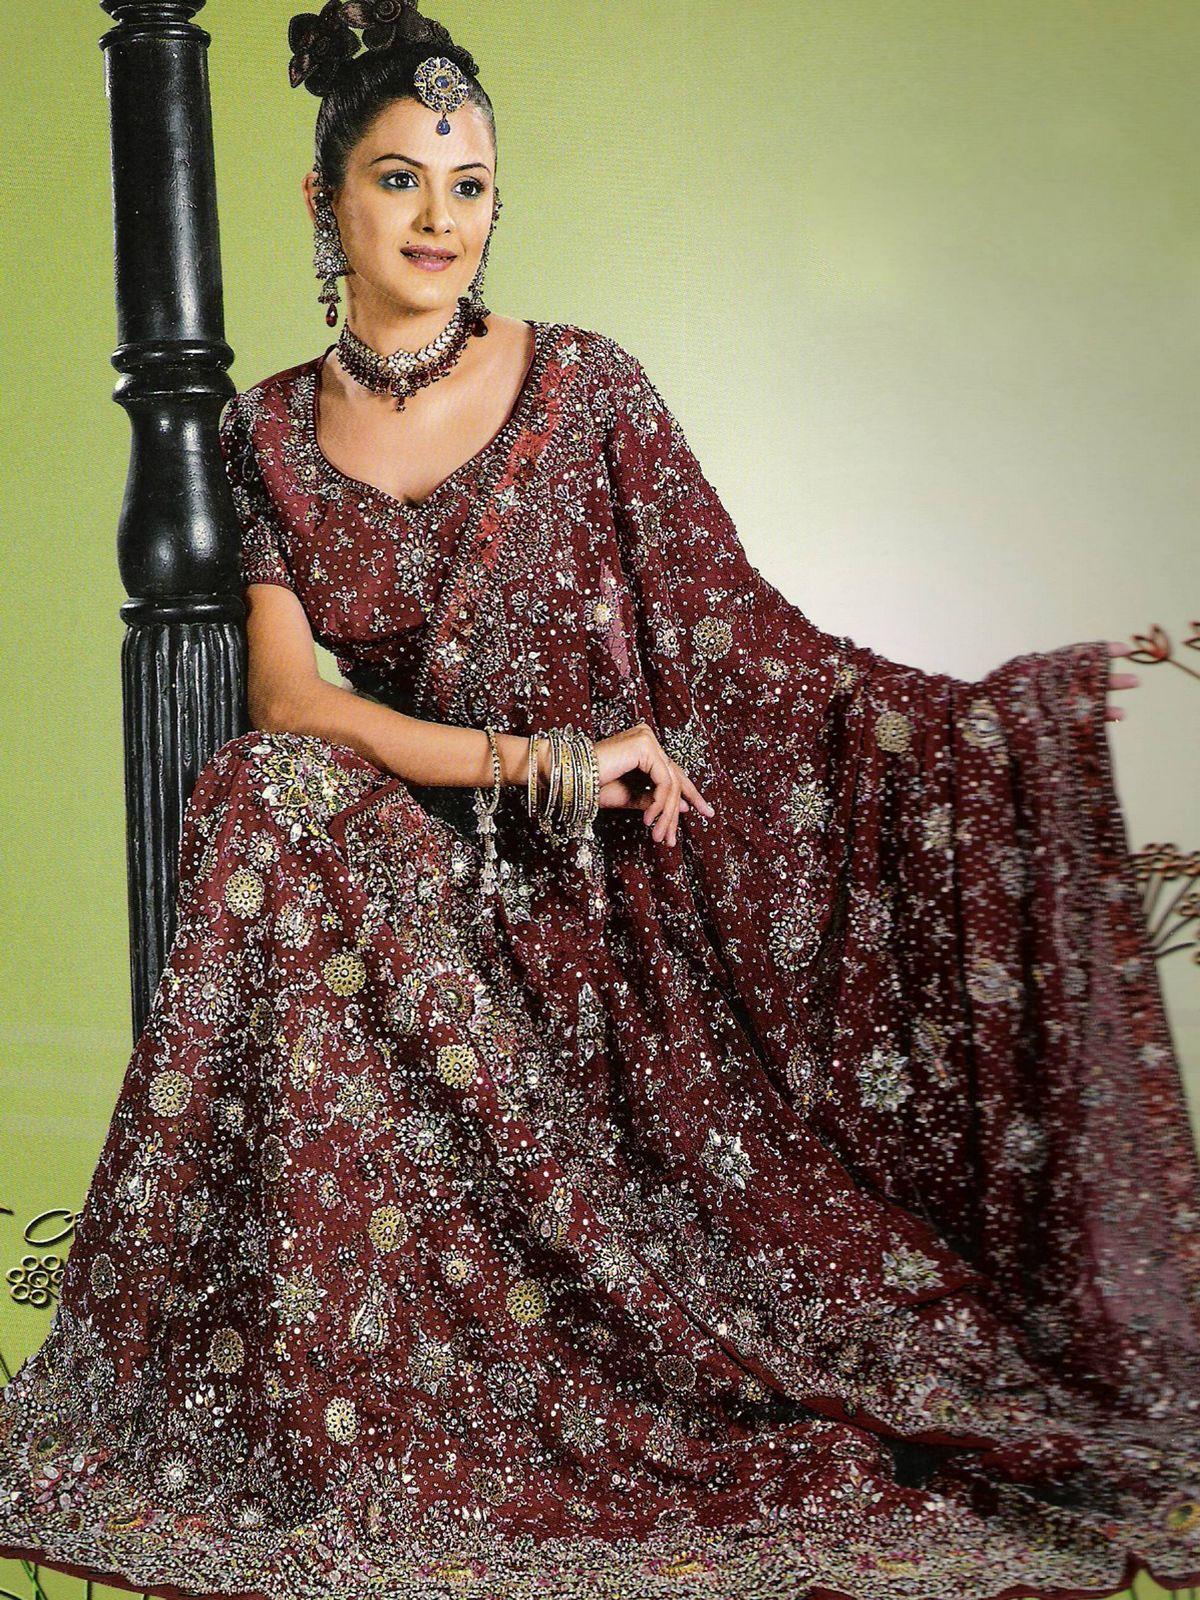 Indian Wedding Dresses For Girls 1200x1600 Download Hd Wallpaper Wallpapertip